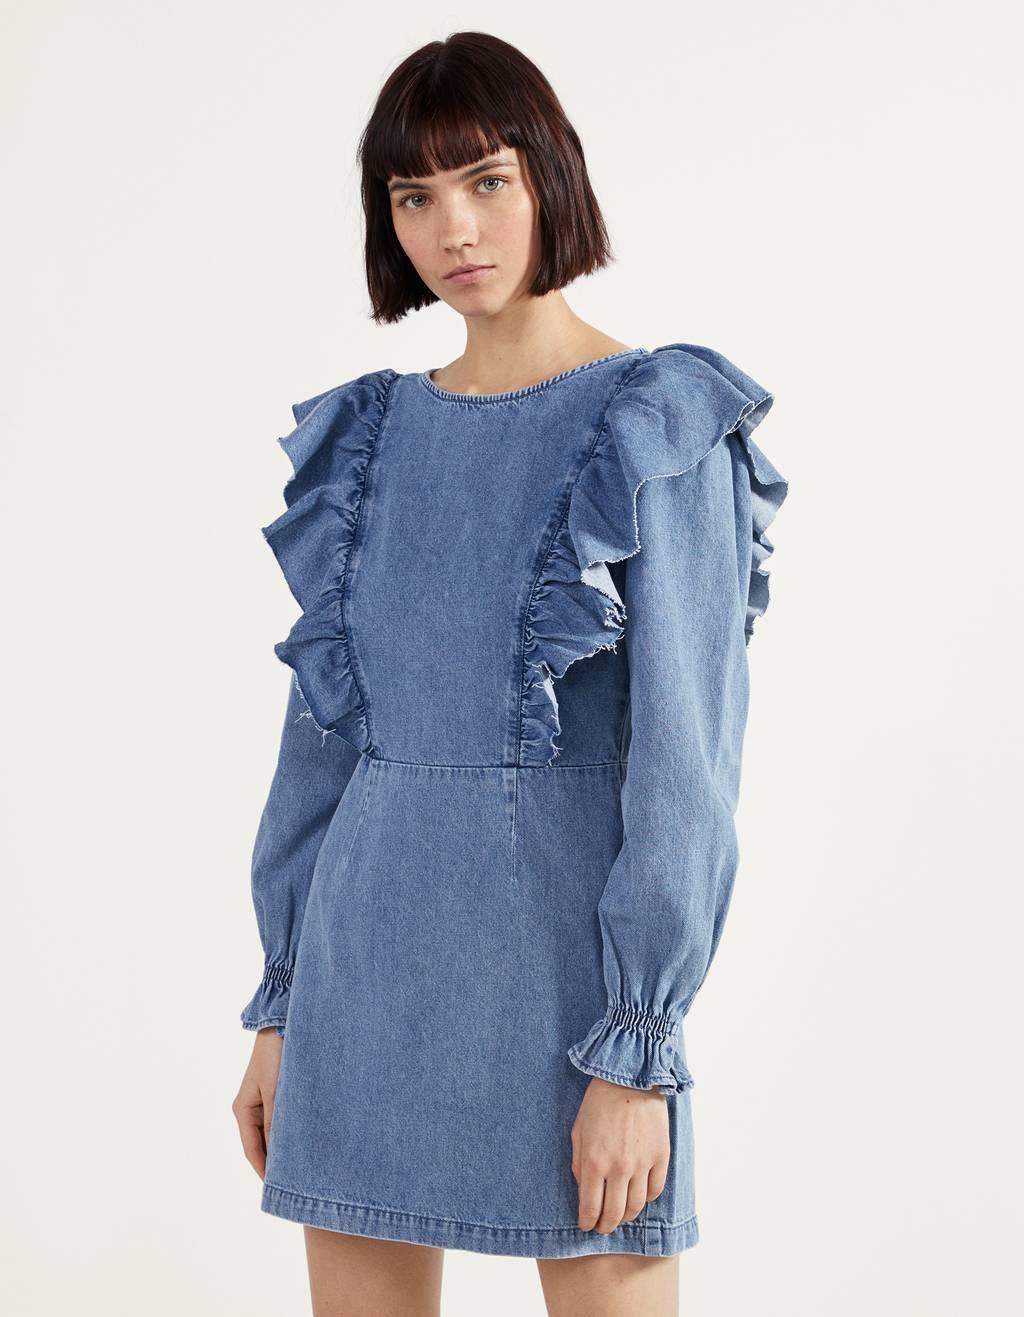 Damen Ärmellos Mini Denim Kleid Bleistiftkleid Knopf Jeans V-Ausschnitt Bodycorn